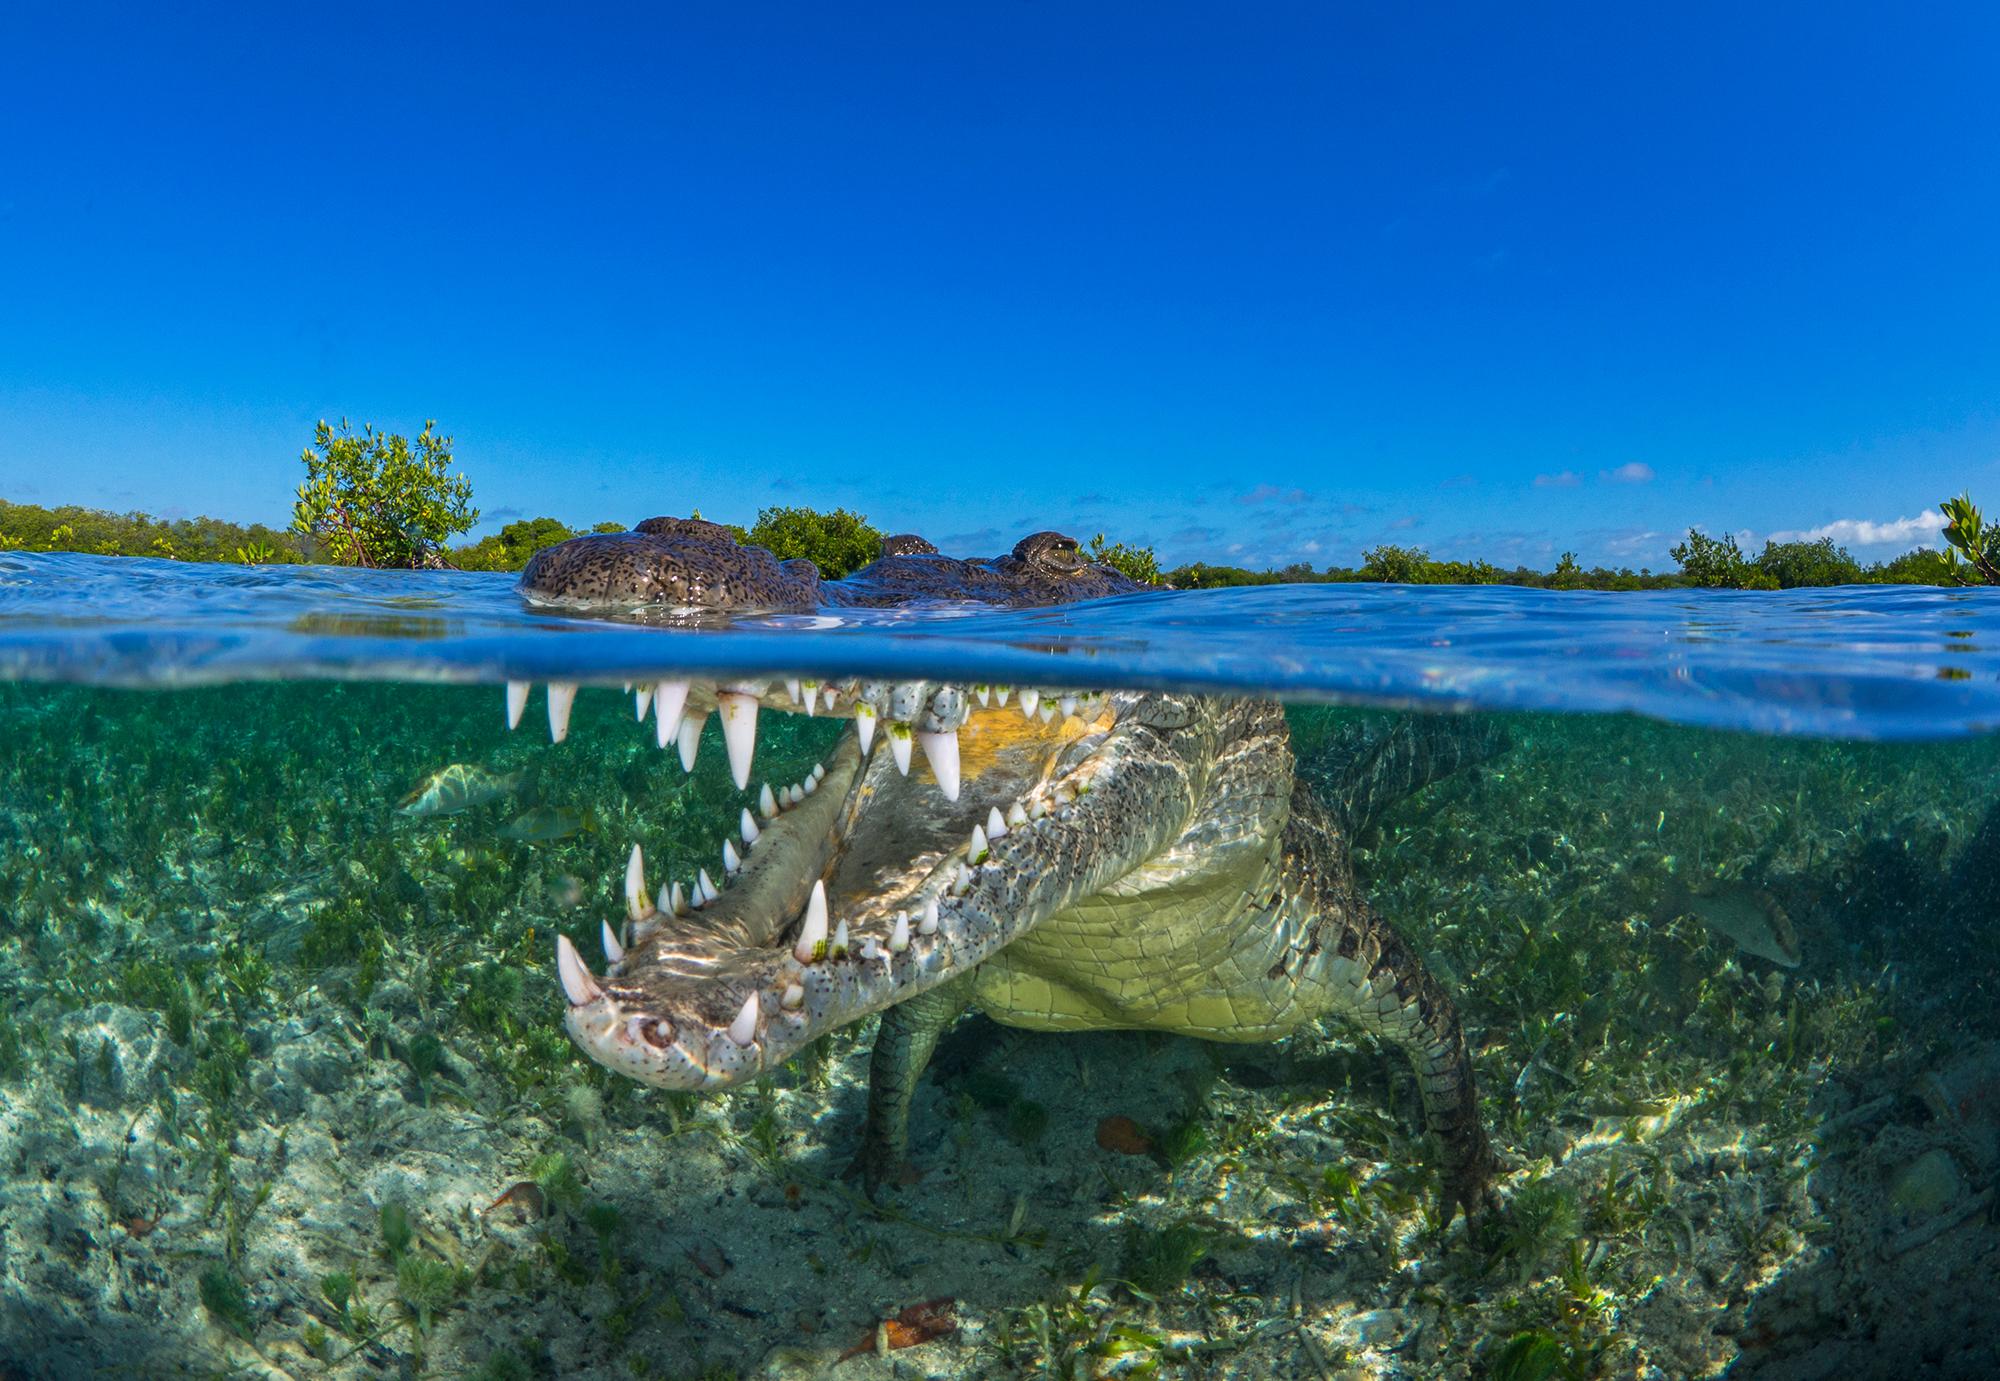 The Ocean Agency, Mangrove, Ocean Image Bank, Sean Chinn, Crocodile, Mangrove